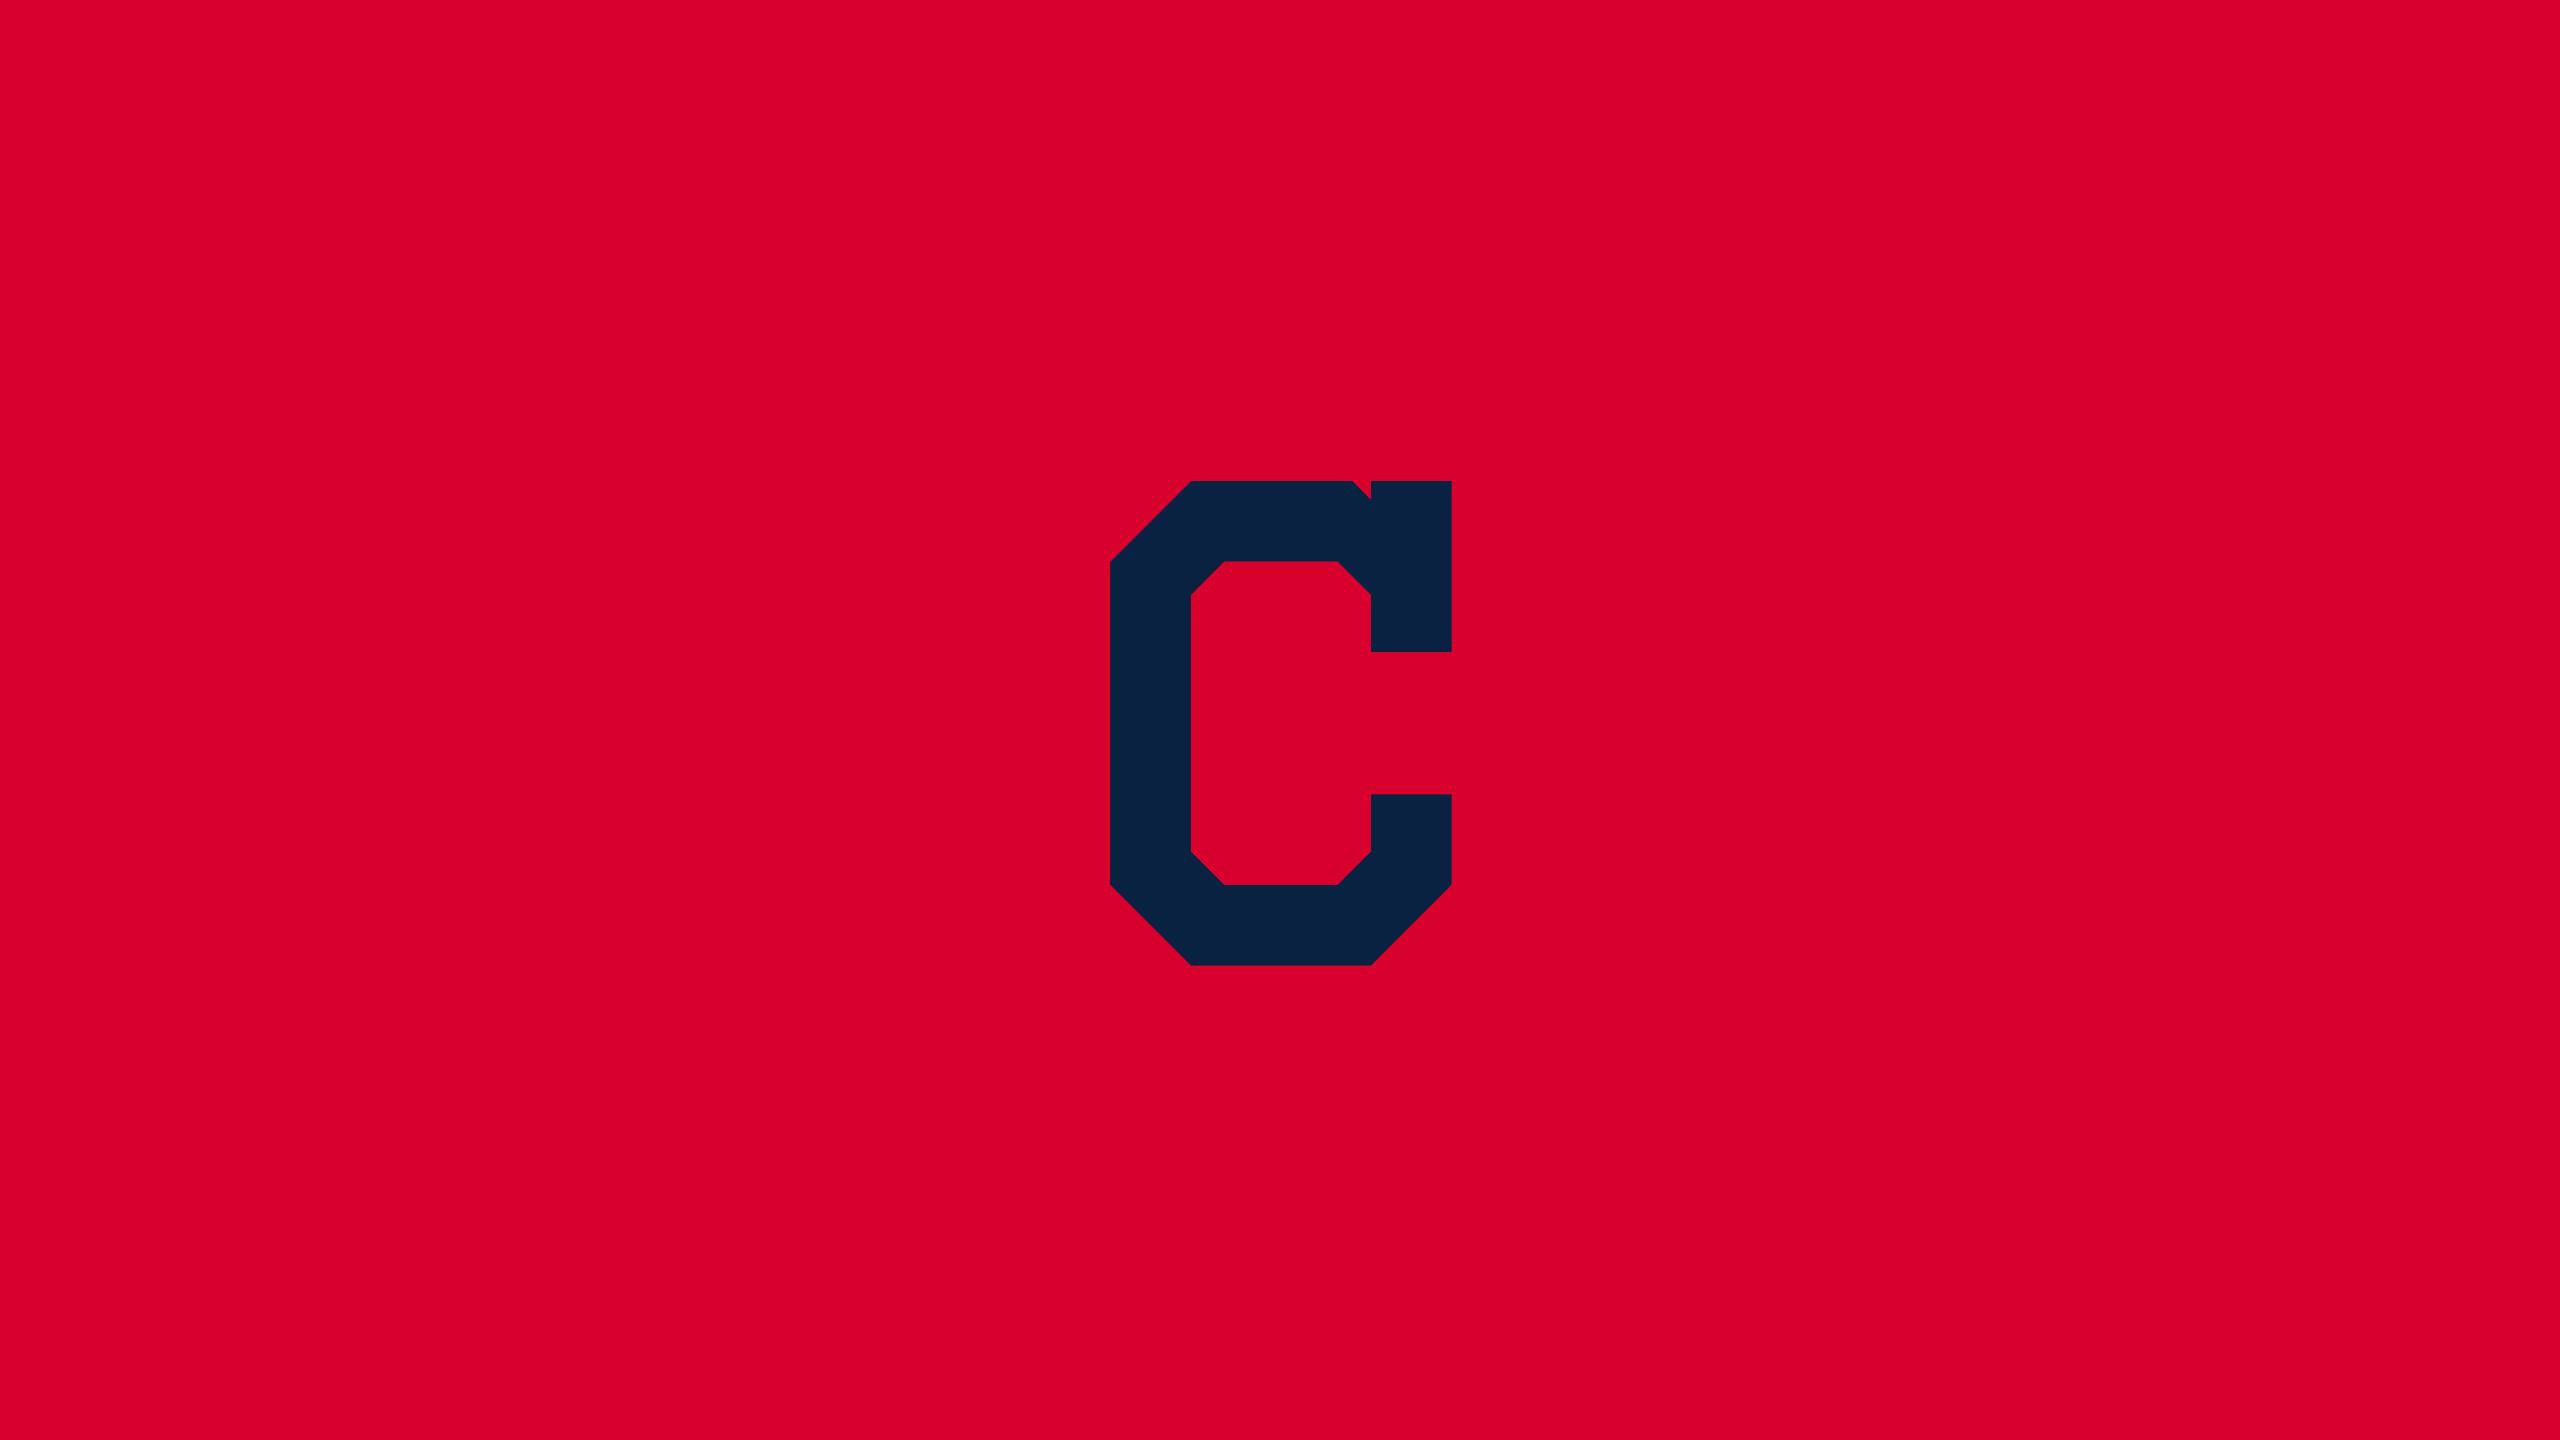 Baseball – Stephen Clark (sgclark.com)